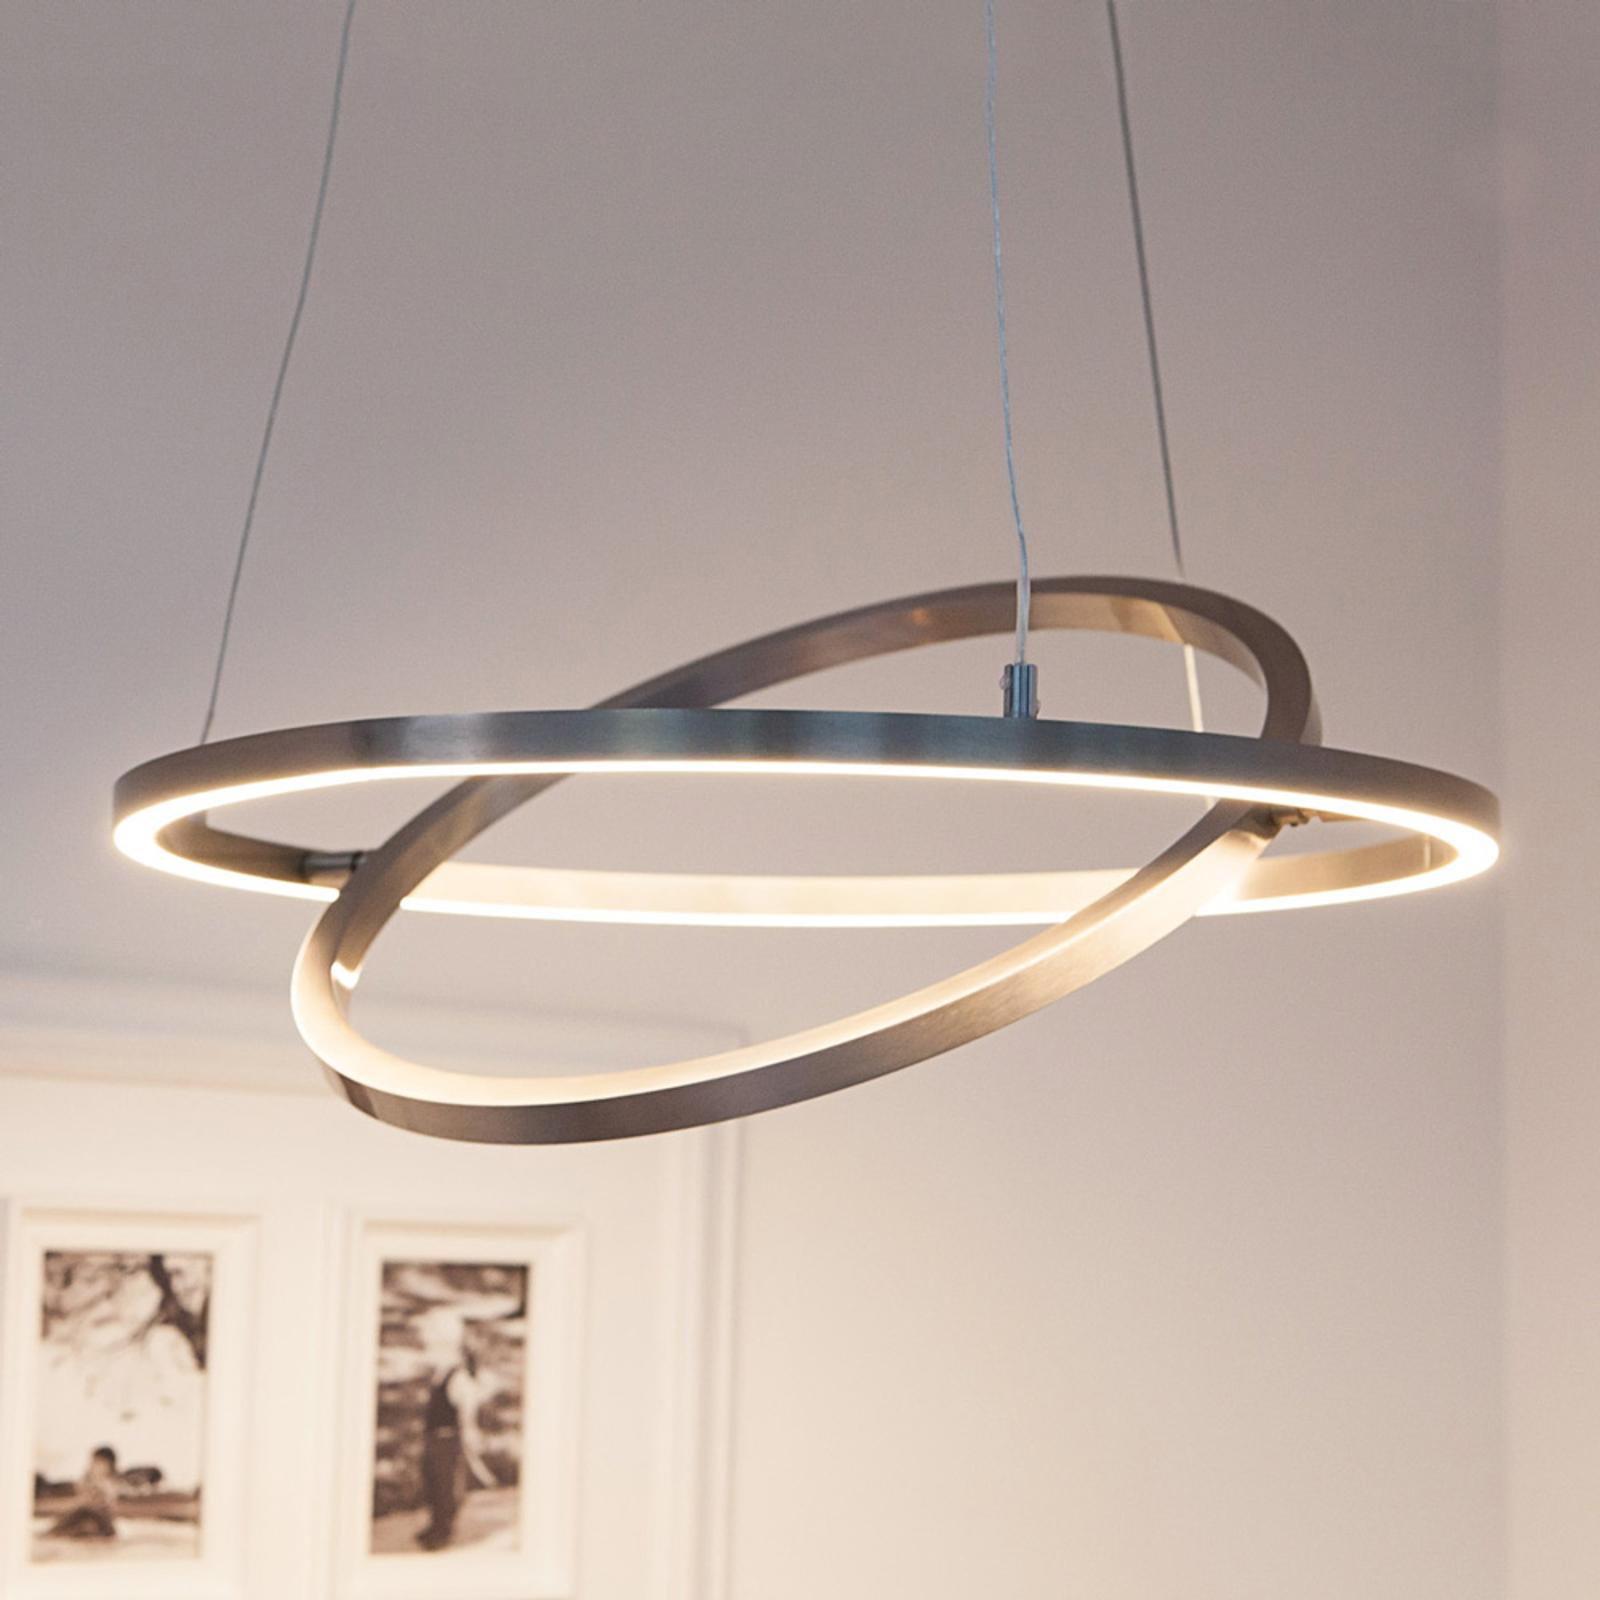 LED-hanglamp Lovisa met twee LED-ringen